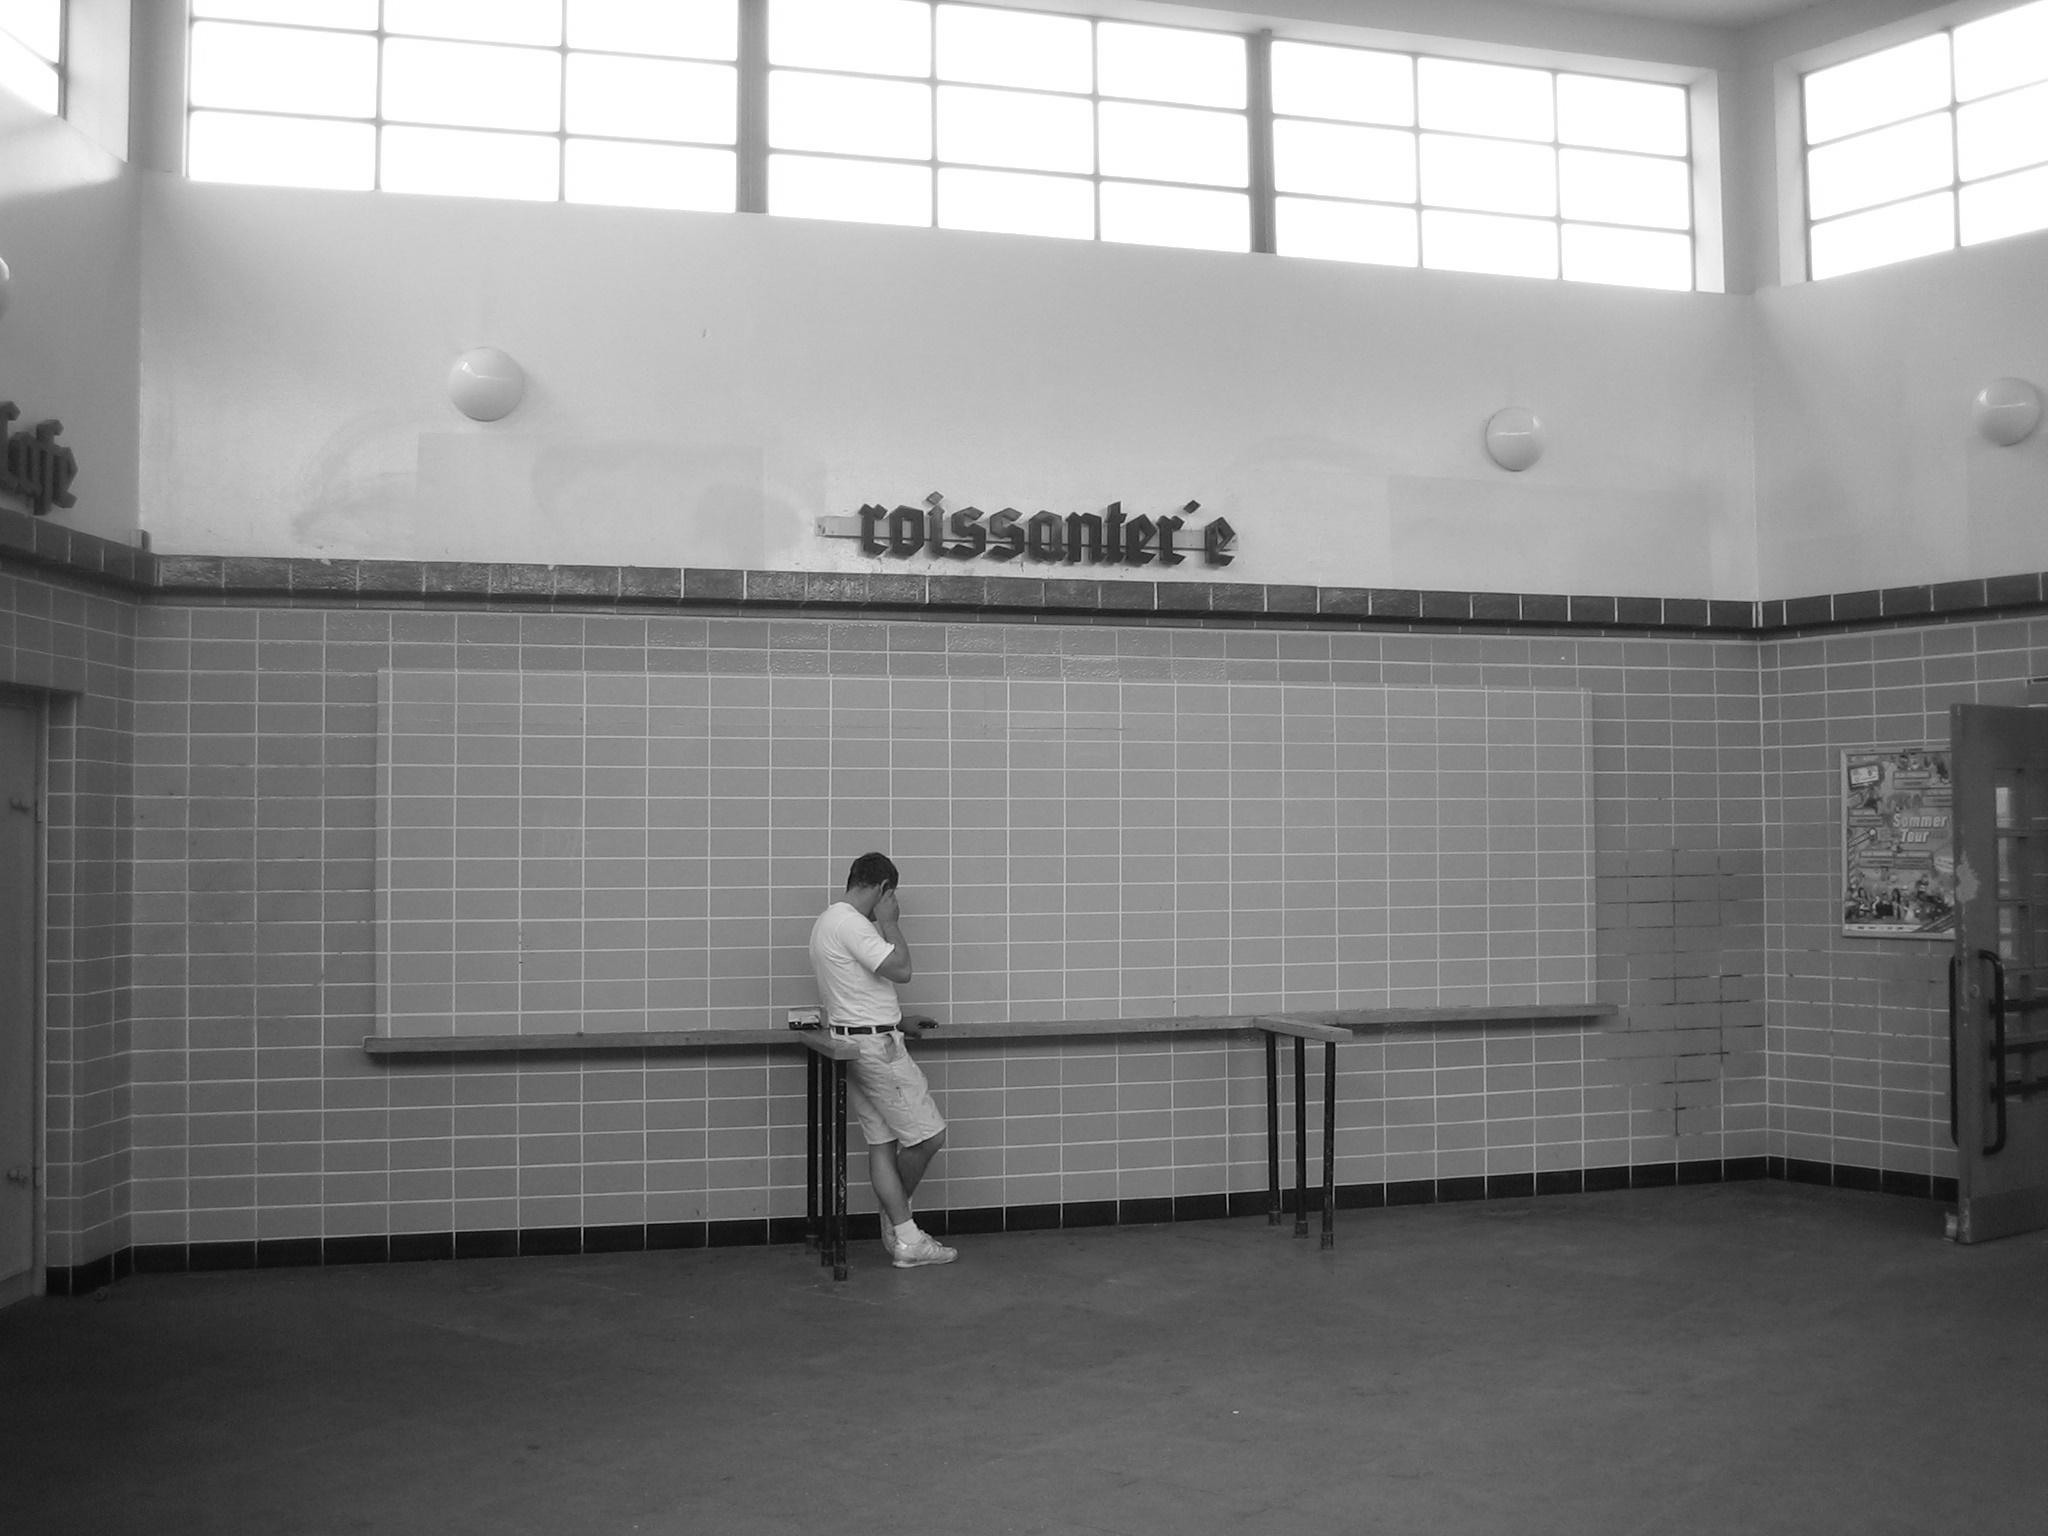 Croissanterie, Berlin |©Anne Seubert